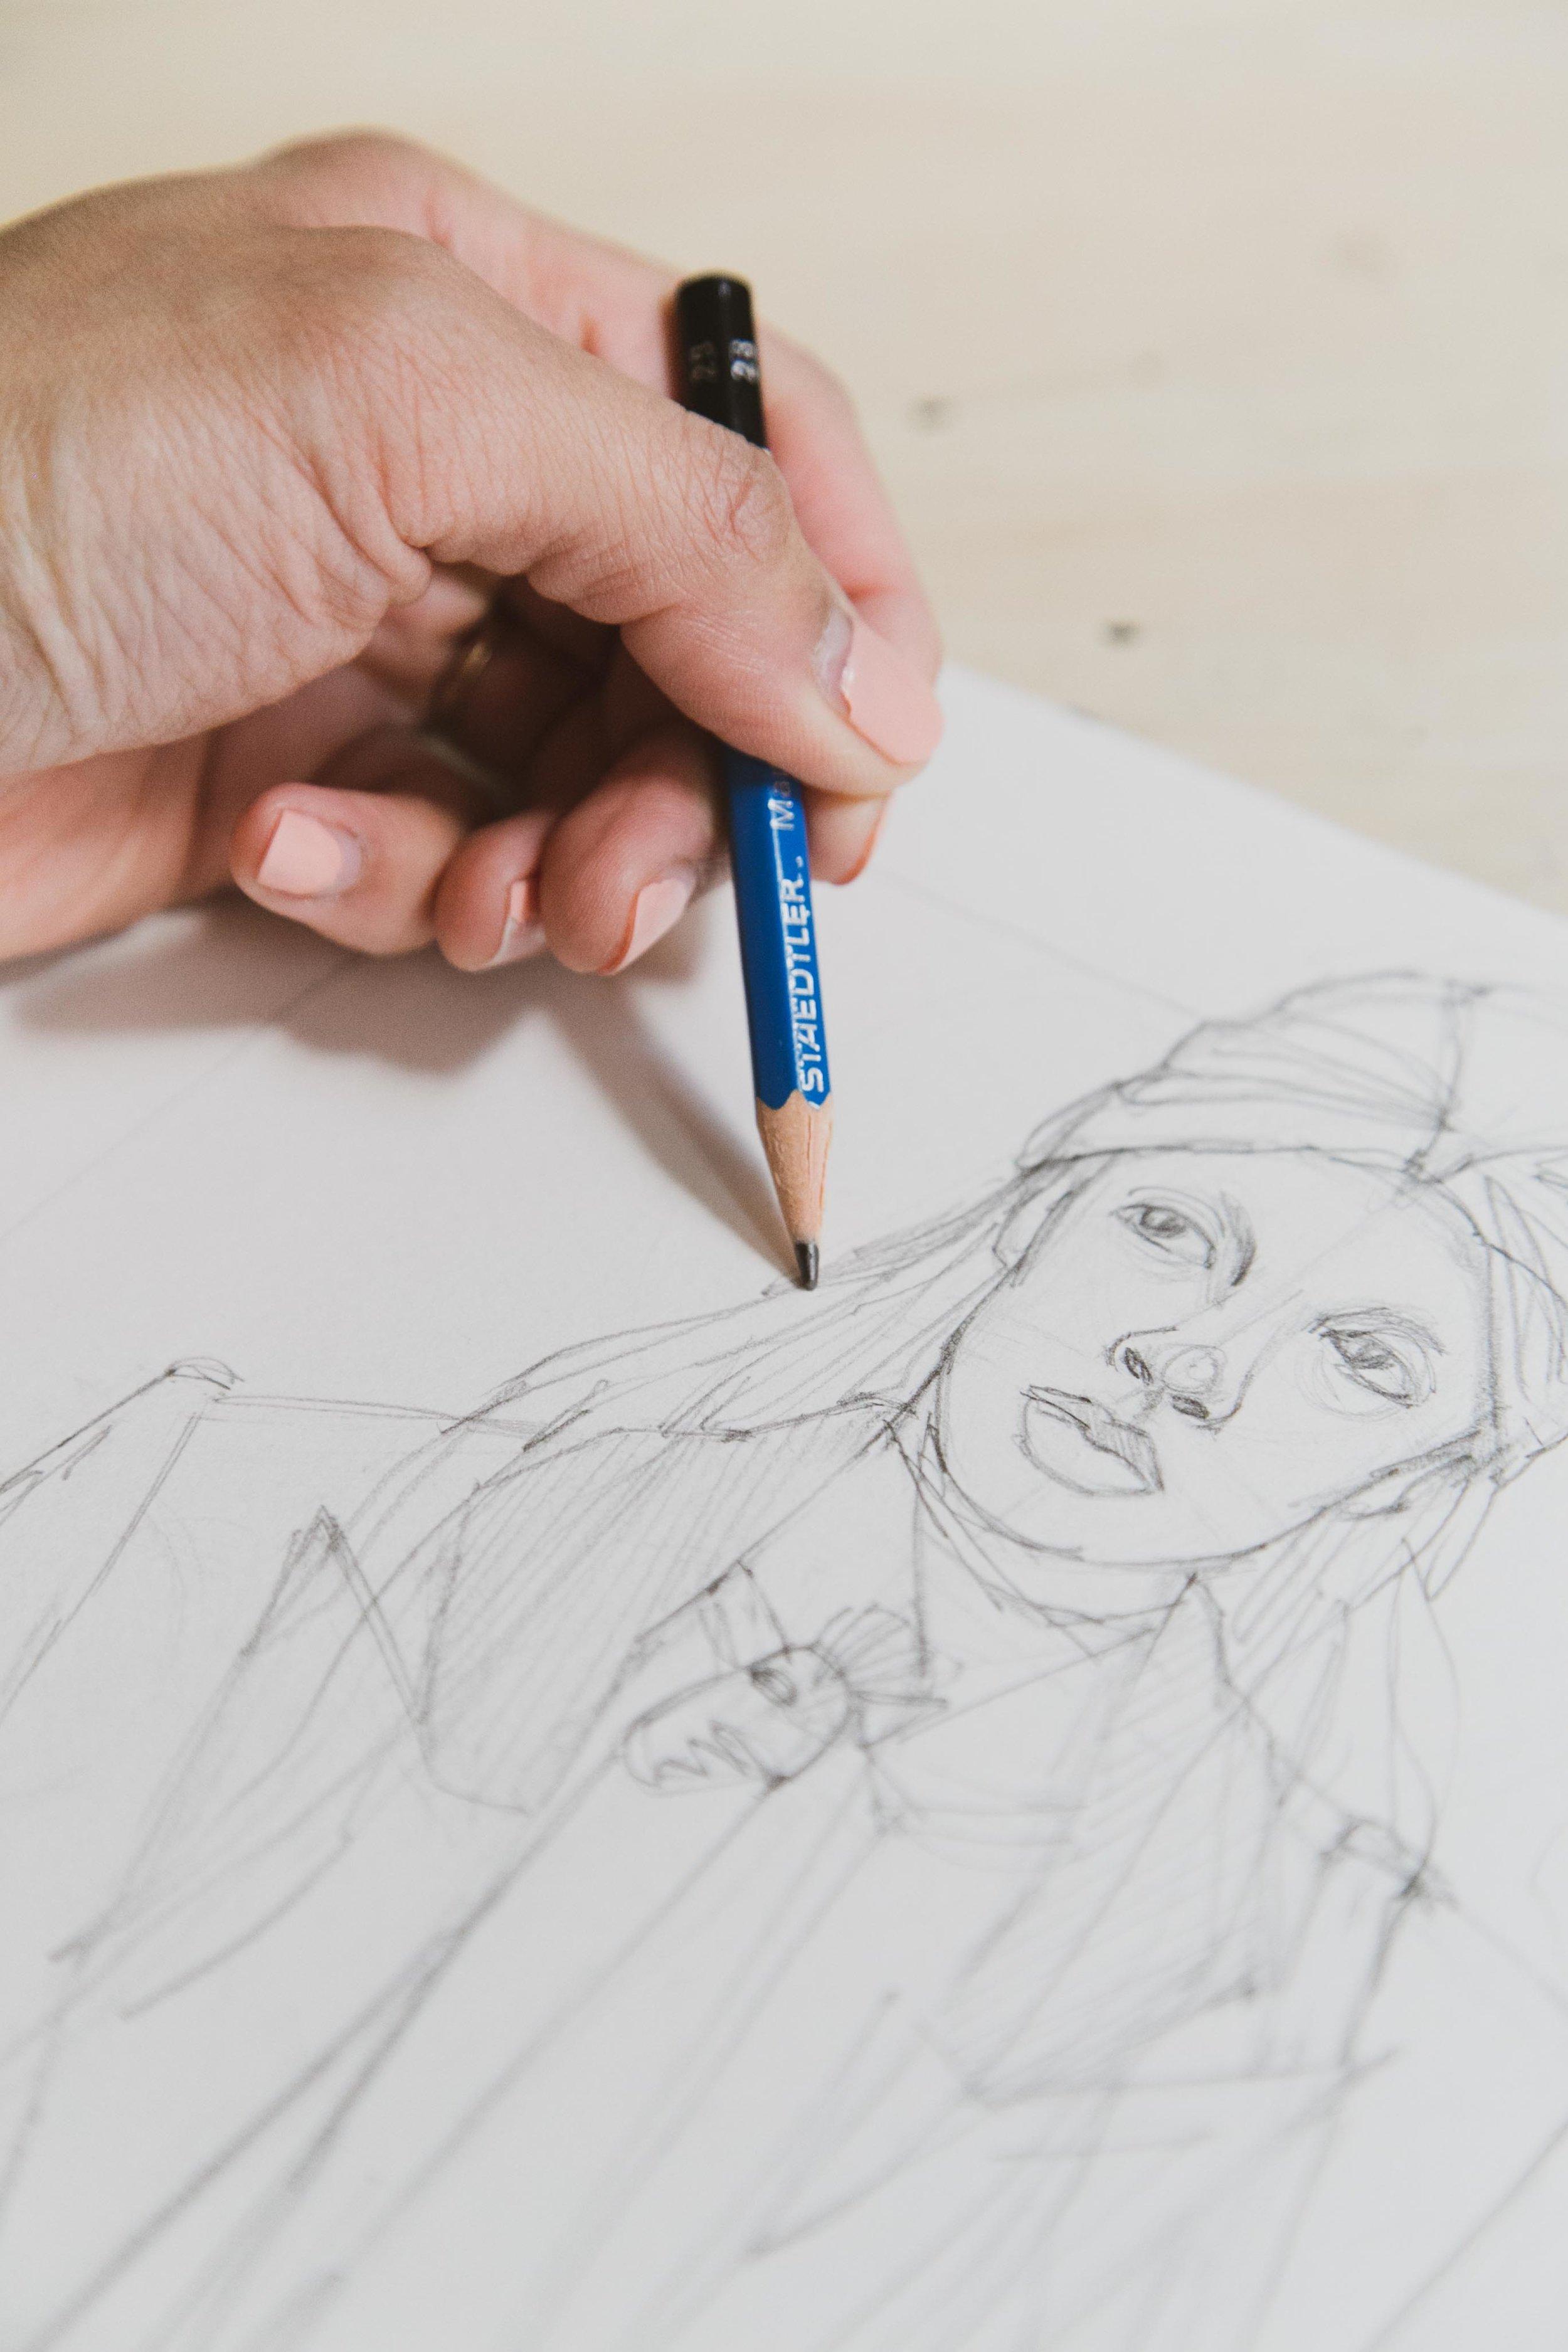 Victoria-Riza Fashion Artist and Illustrator | Kate Spade Fall 2019 RTW